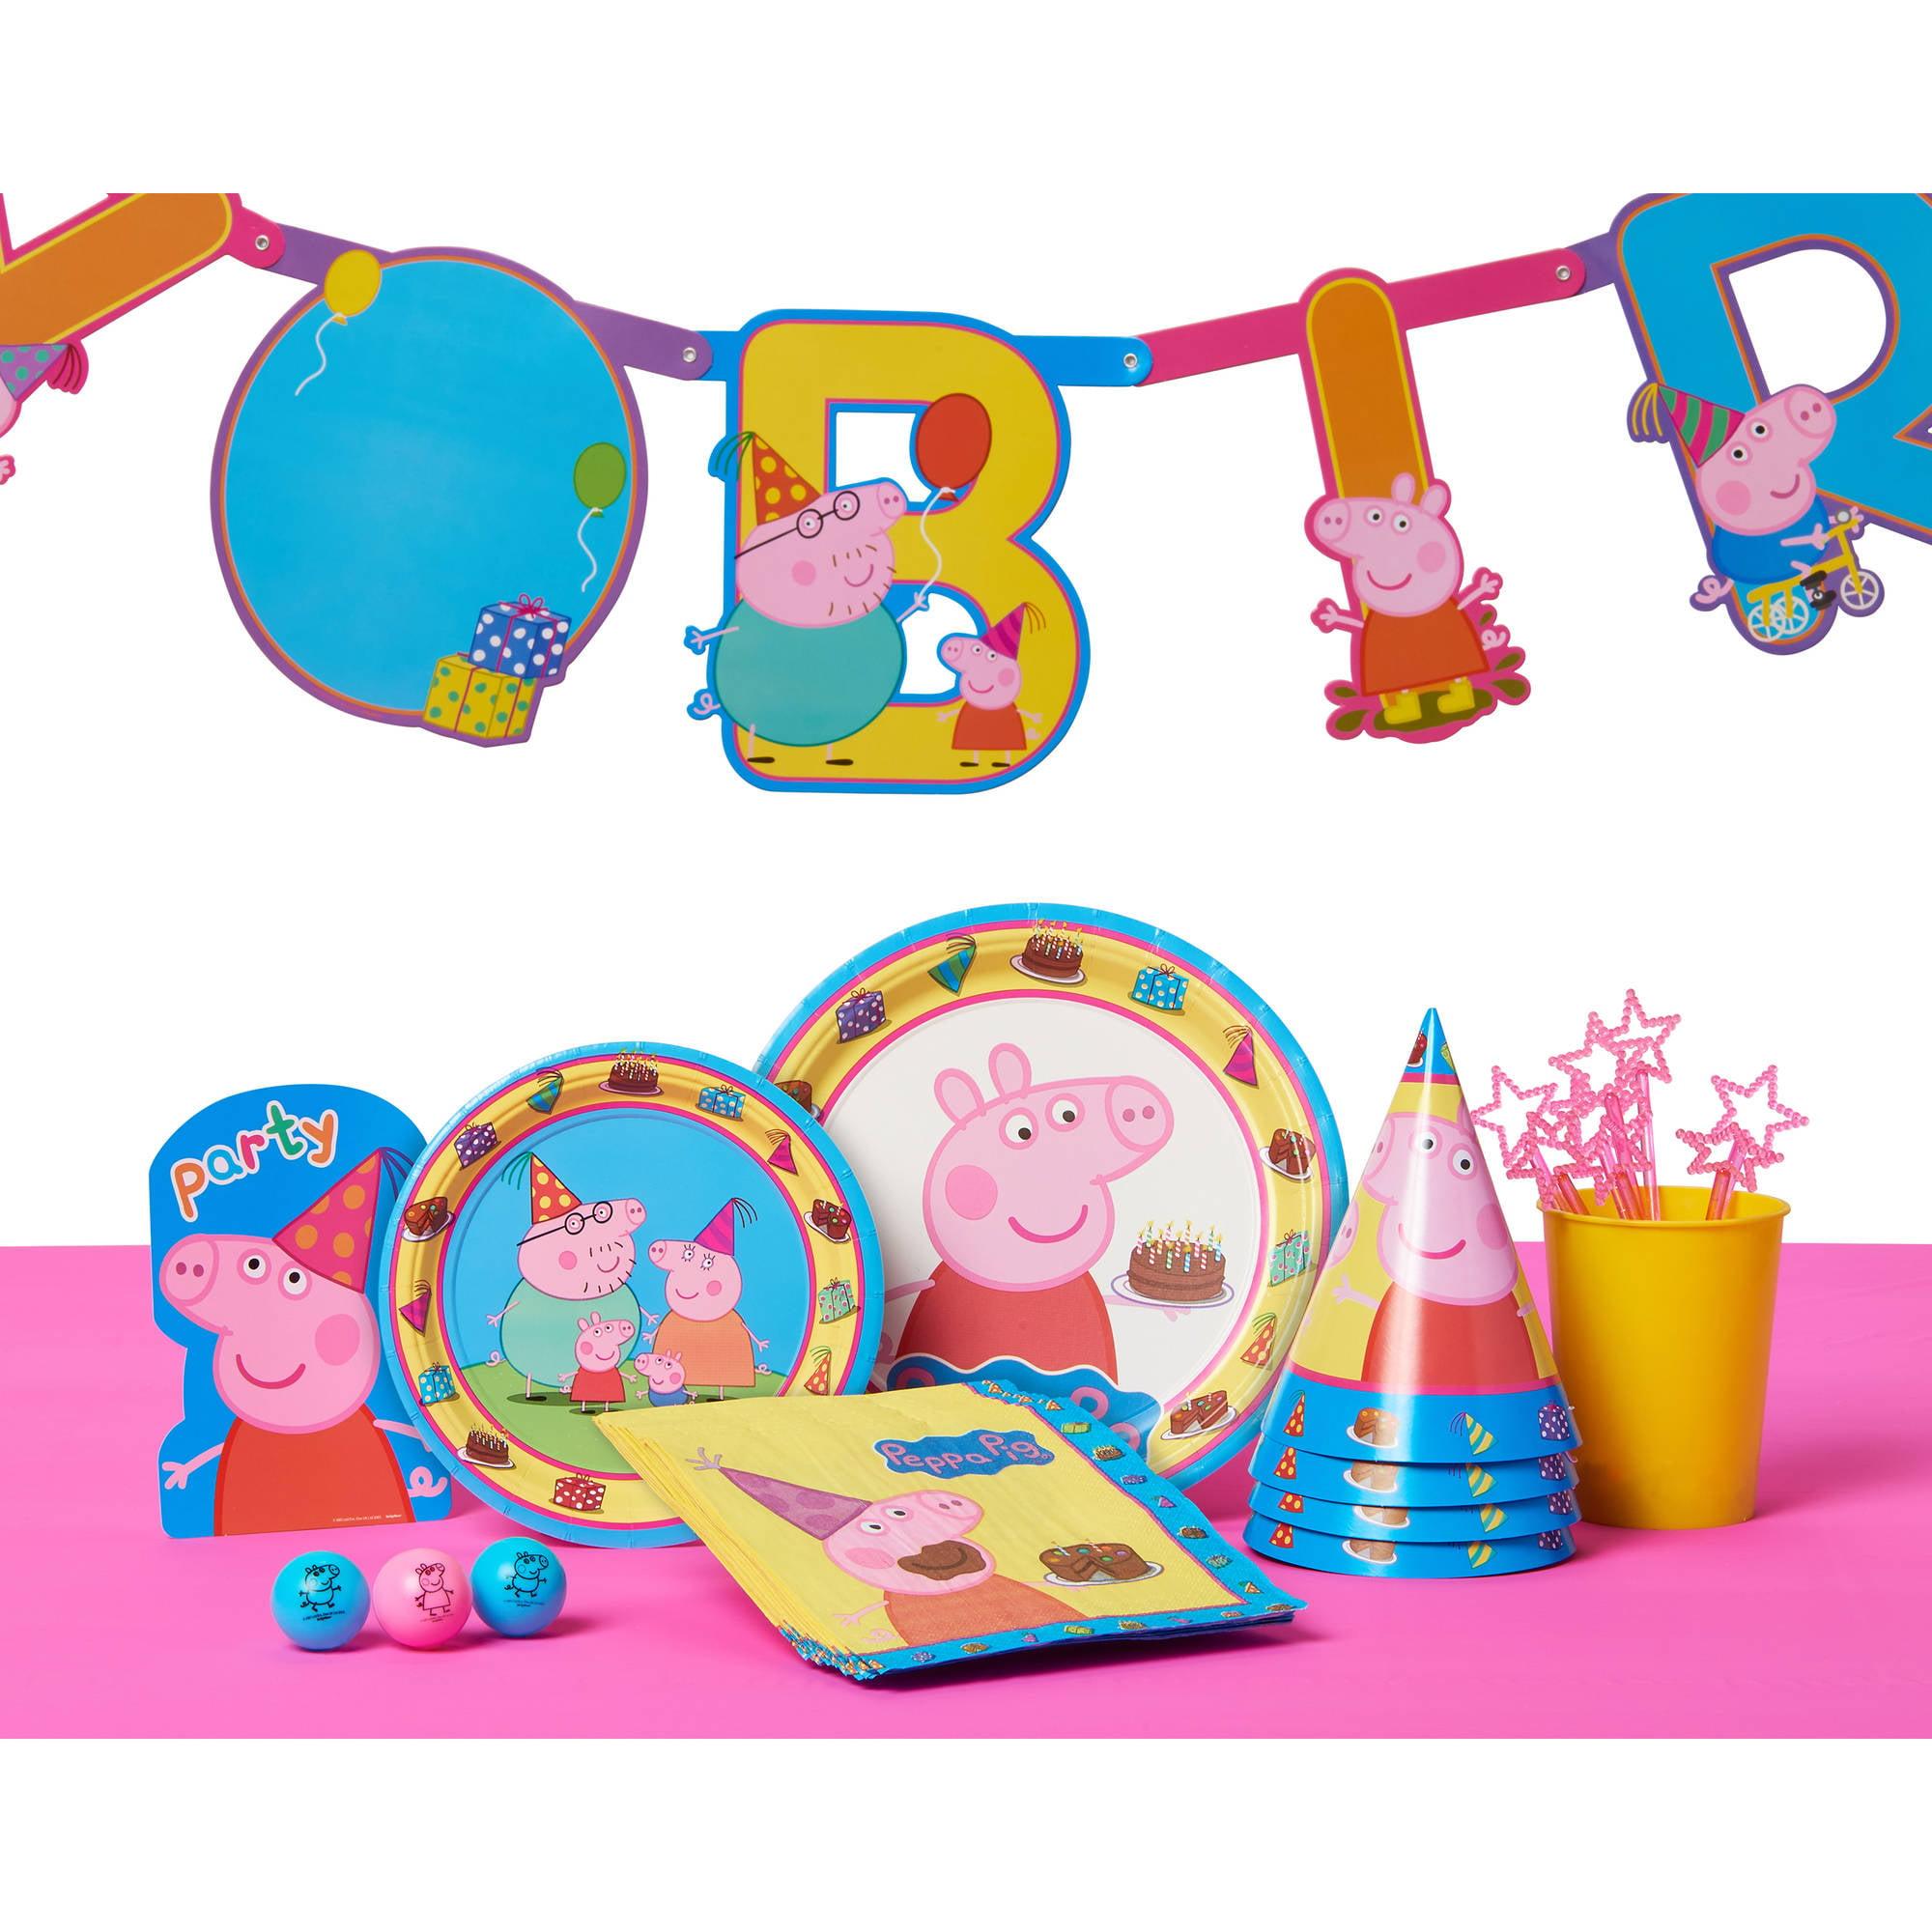 Peppa Pig Birthday Party Invitations 8ct